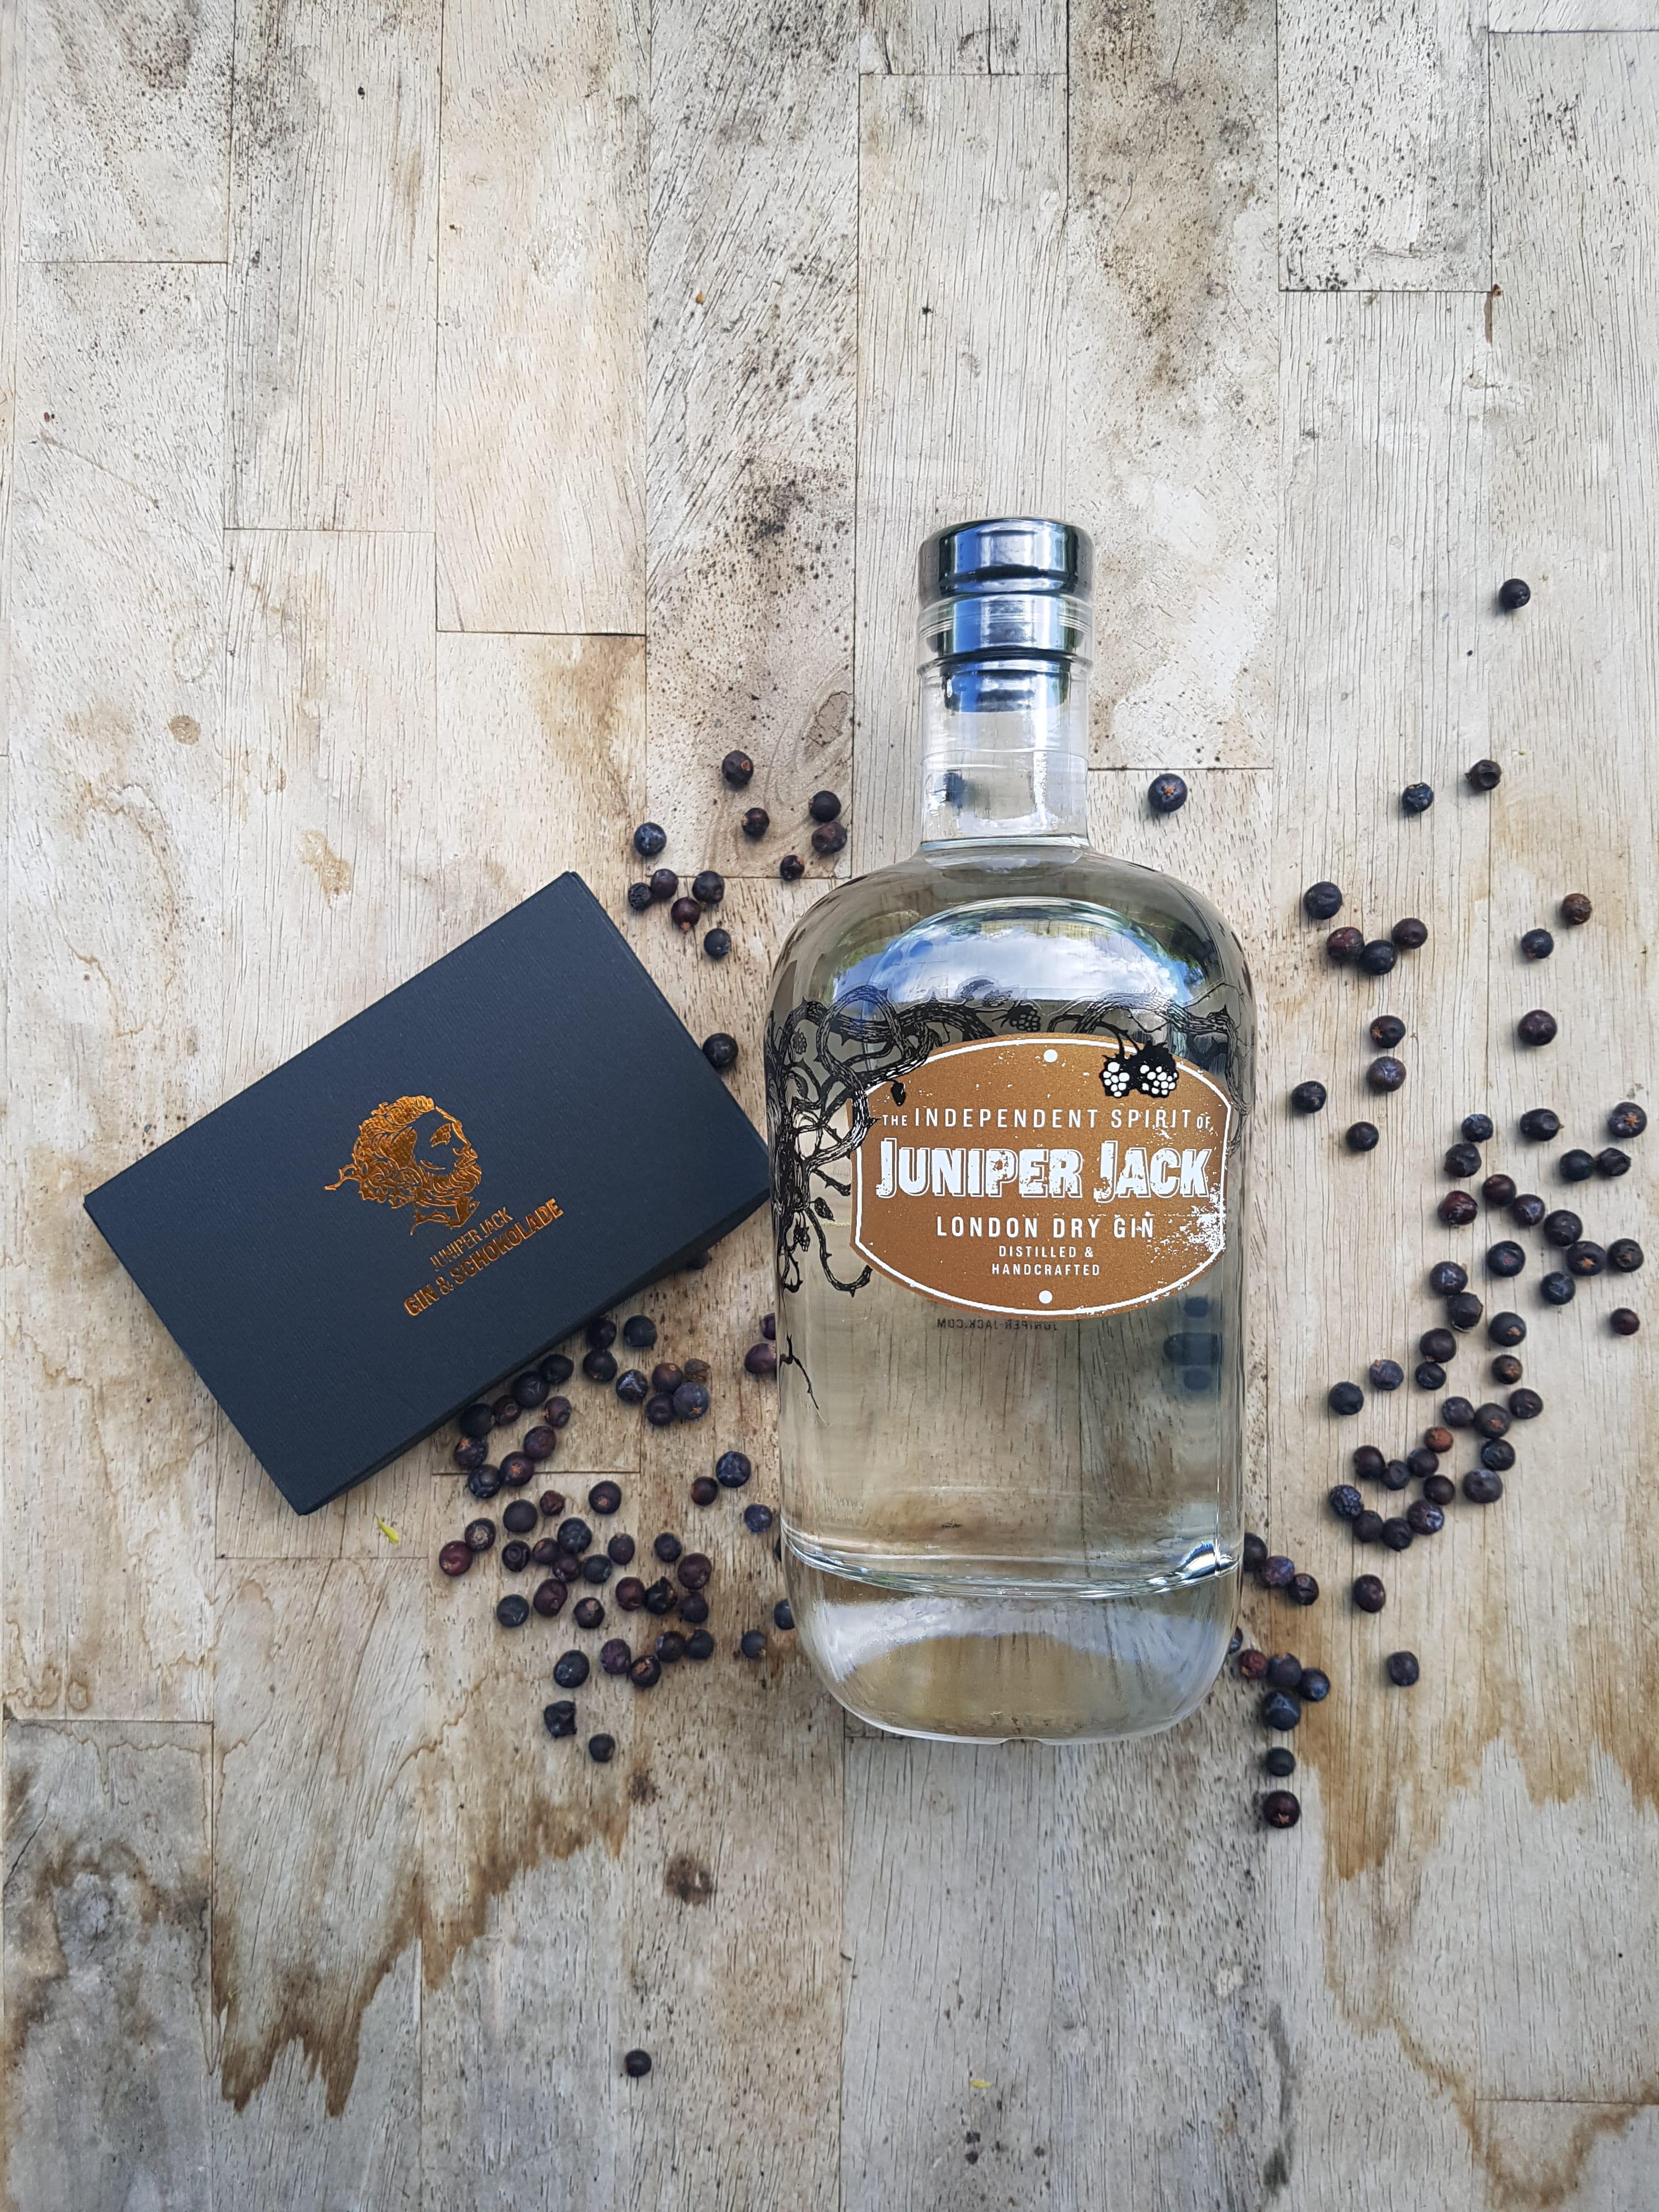 Altes Design Juniper Jack London Dry Gin Flasche